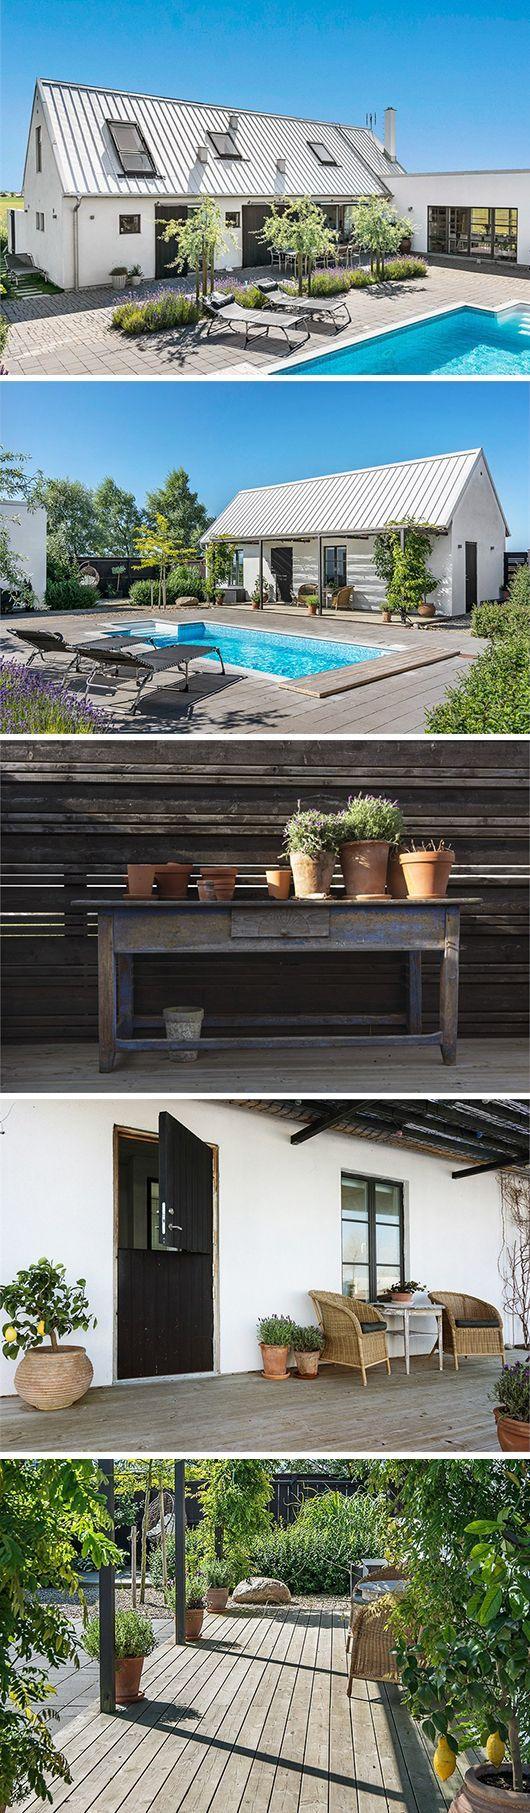 Metal roof, terra cotta planters